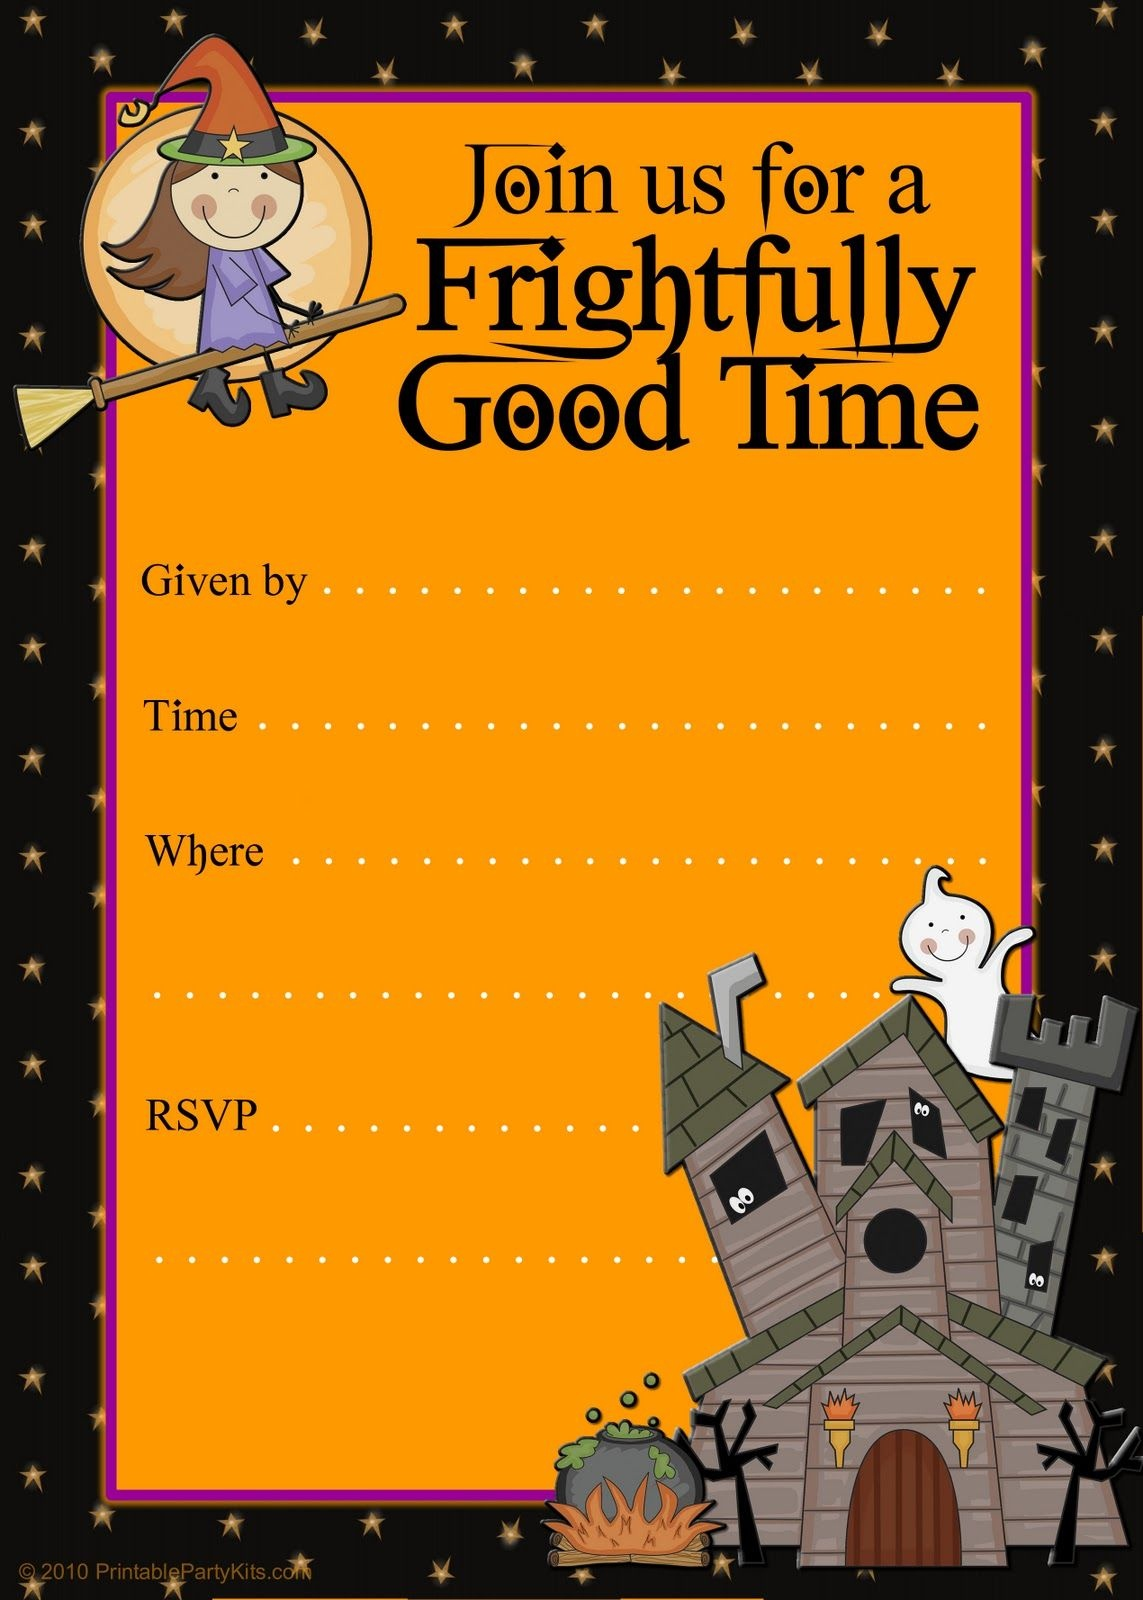 Free Halloween Flyer Invitations Printable | Food | Halloween - Free Printable Birthday Party Flyers